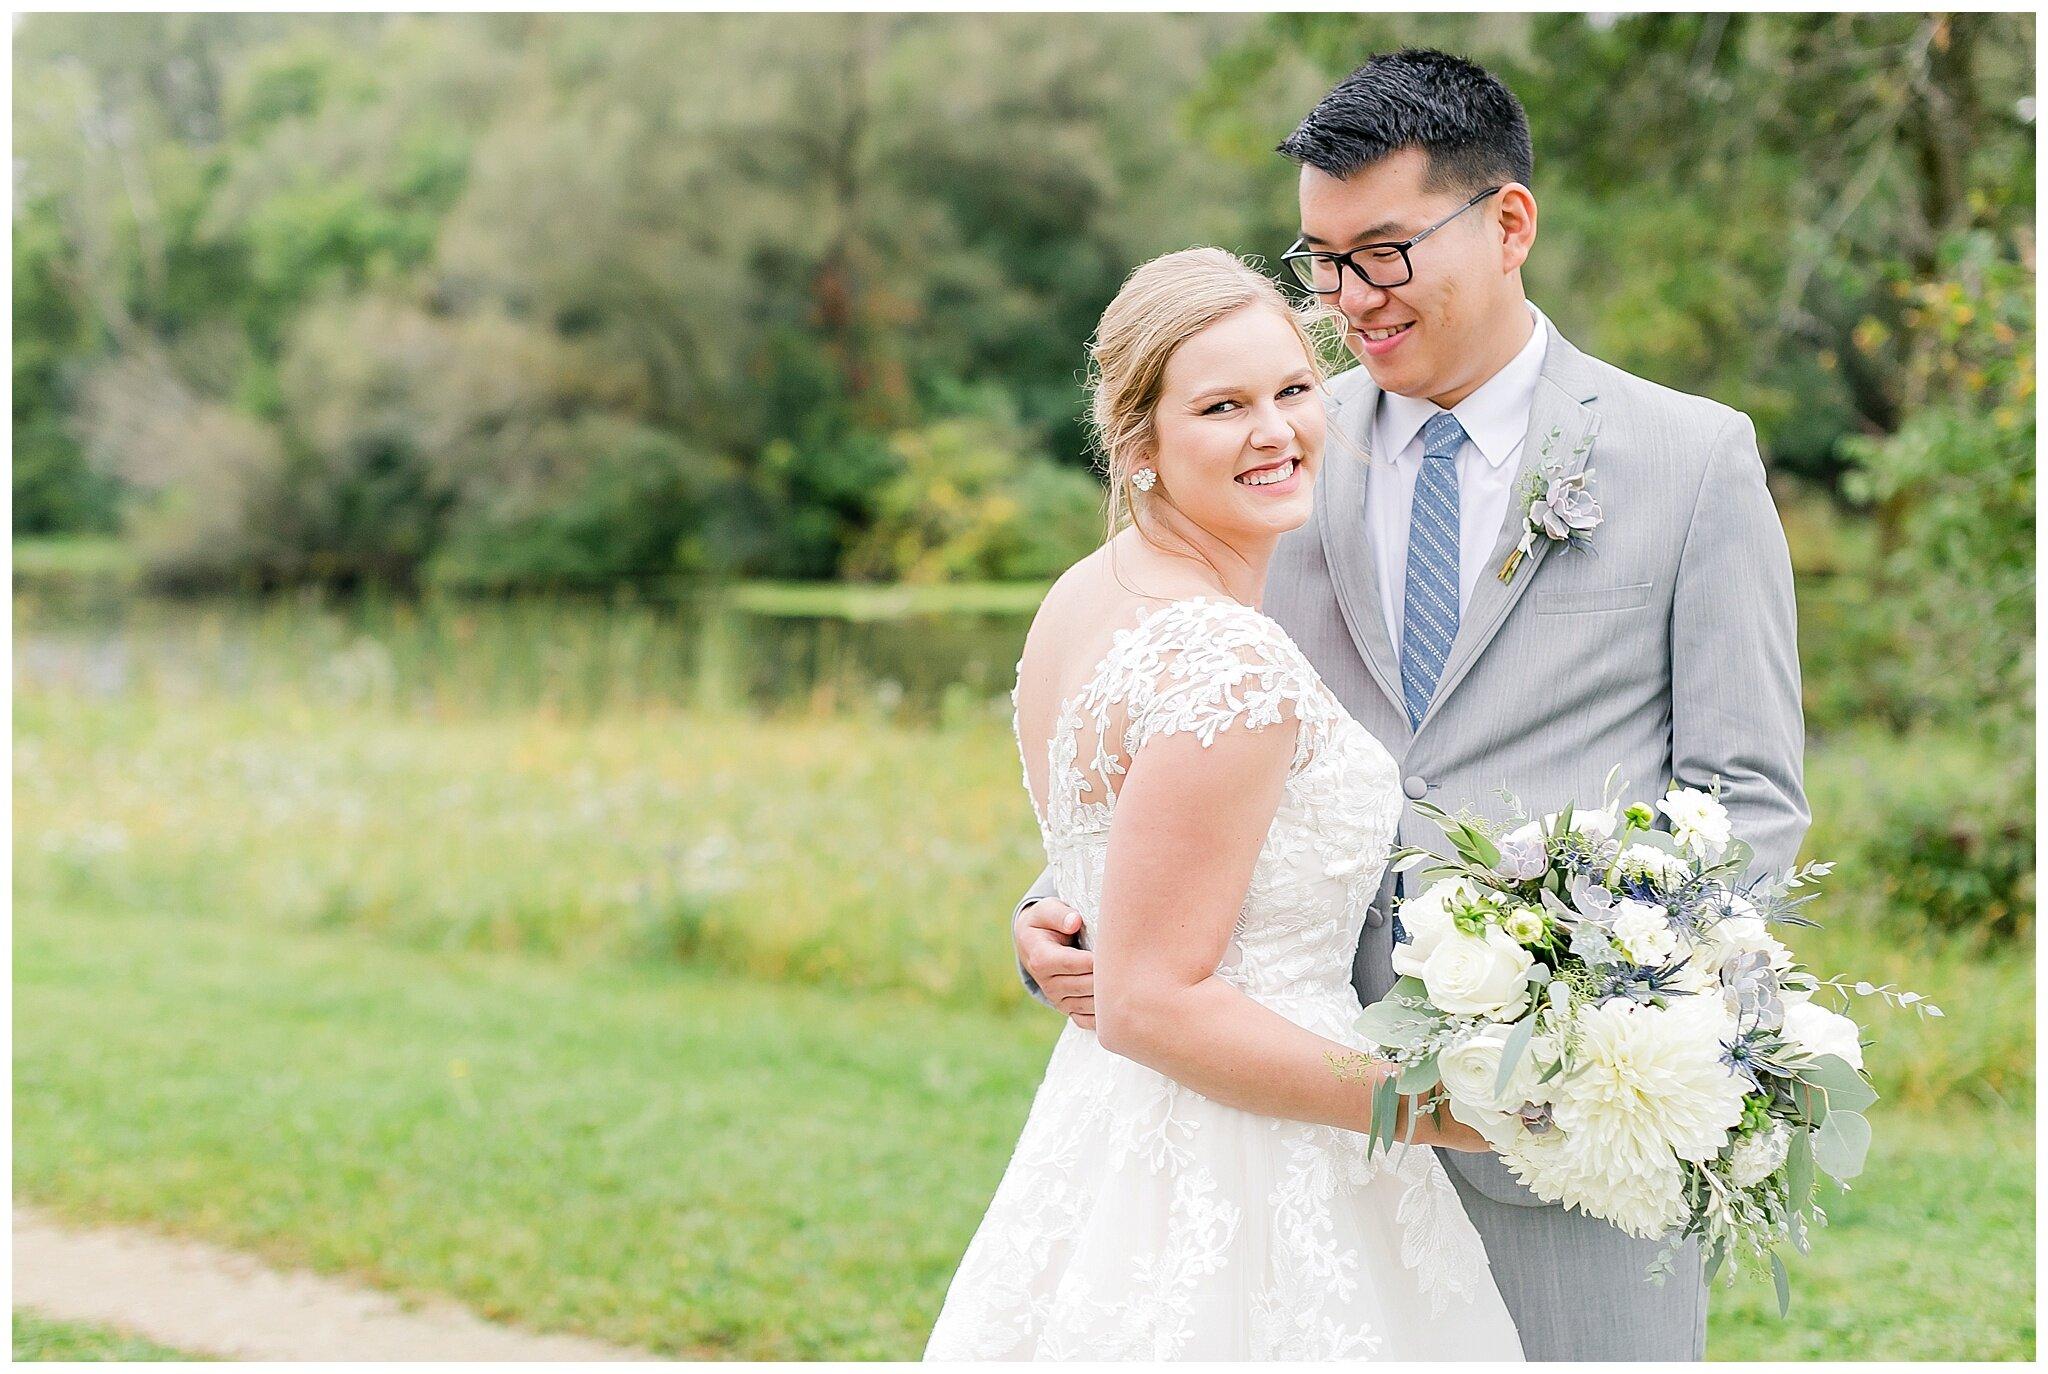 the_lageret_stoughton_wisconsin_wedding_madison_wisconsin_wedding_photographers_0238.jpg